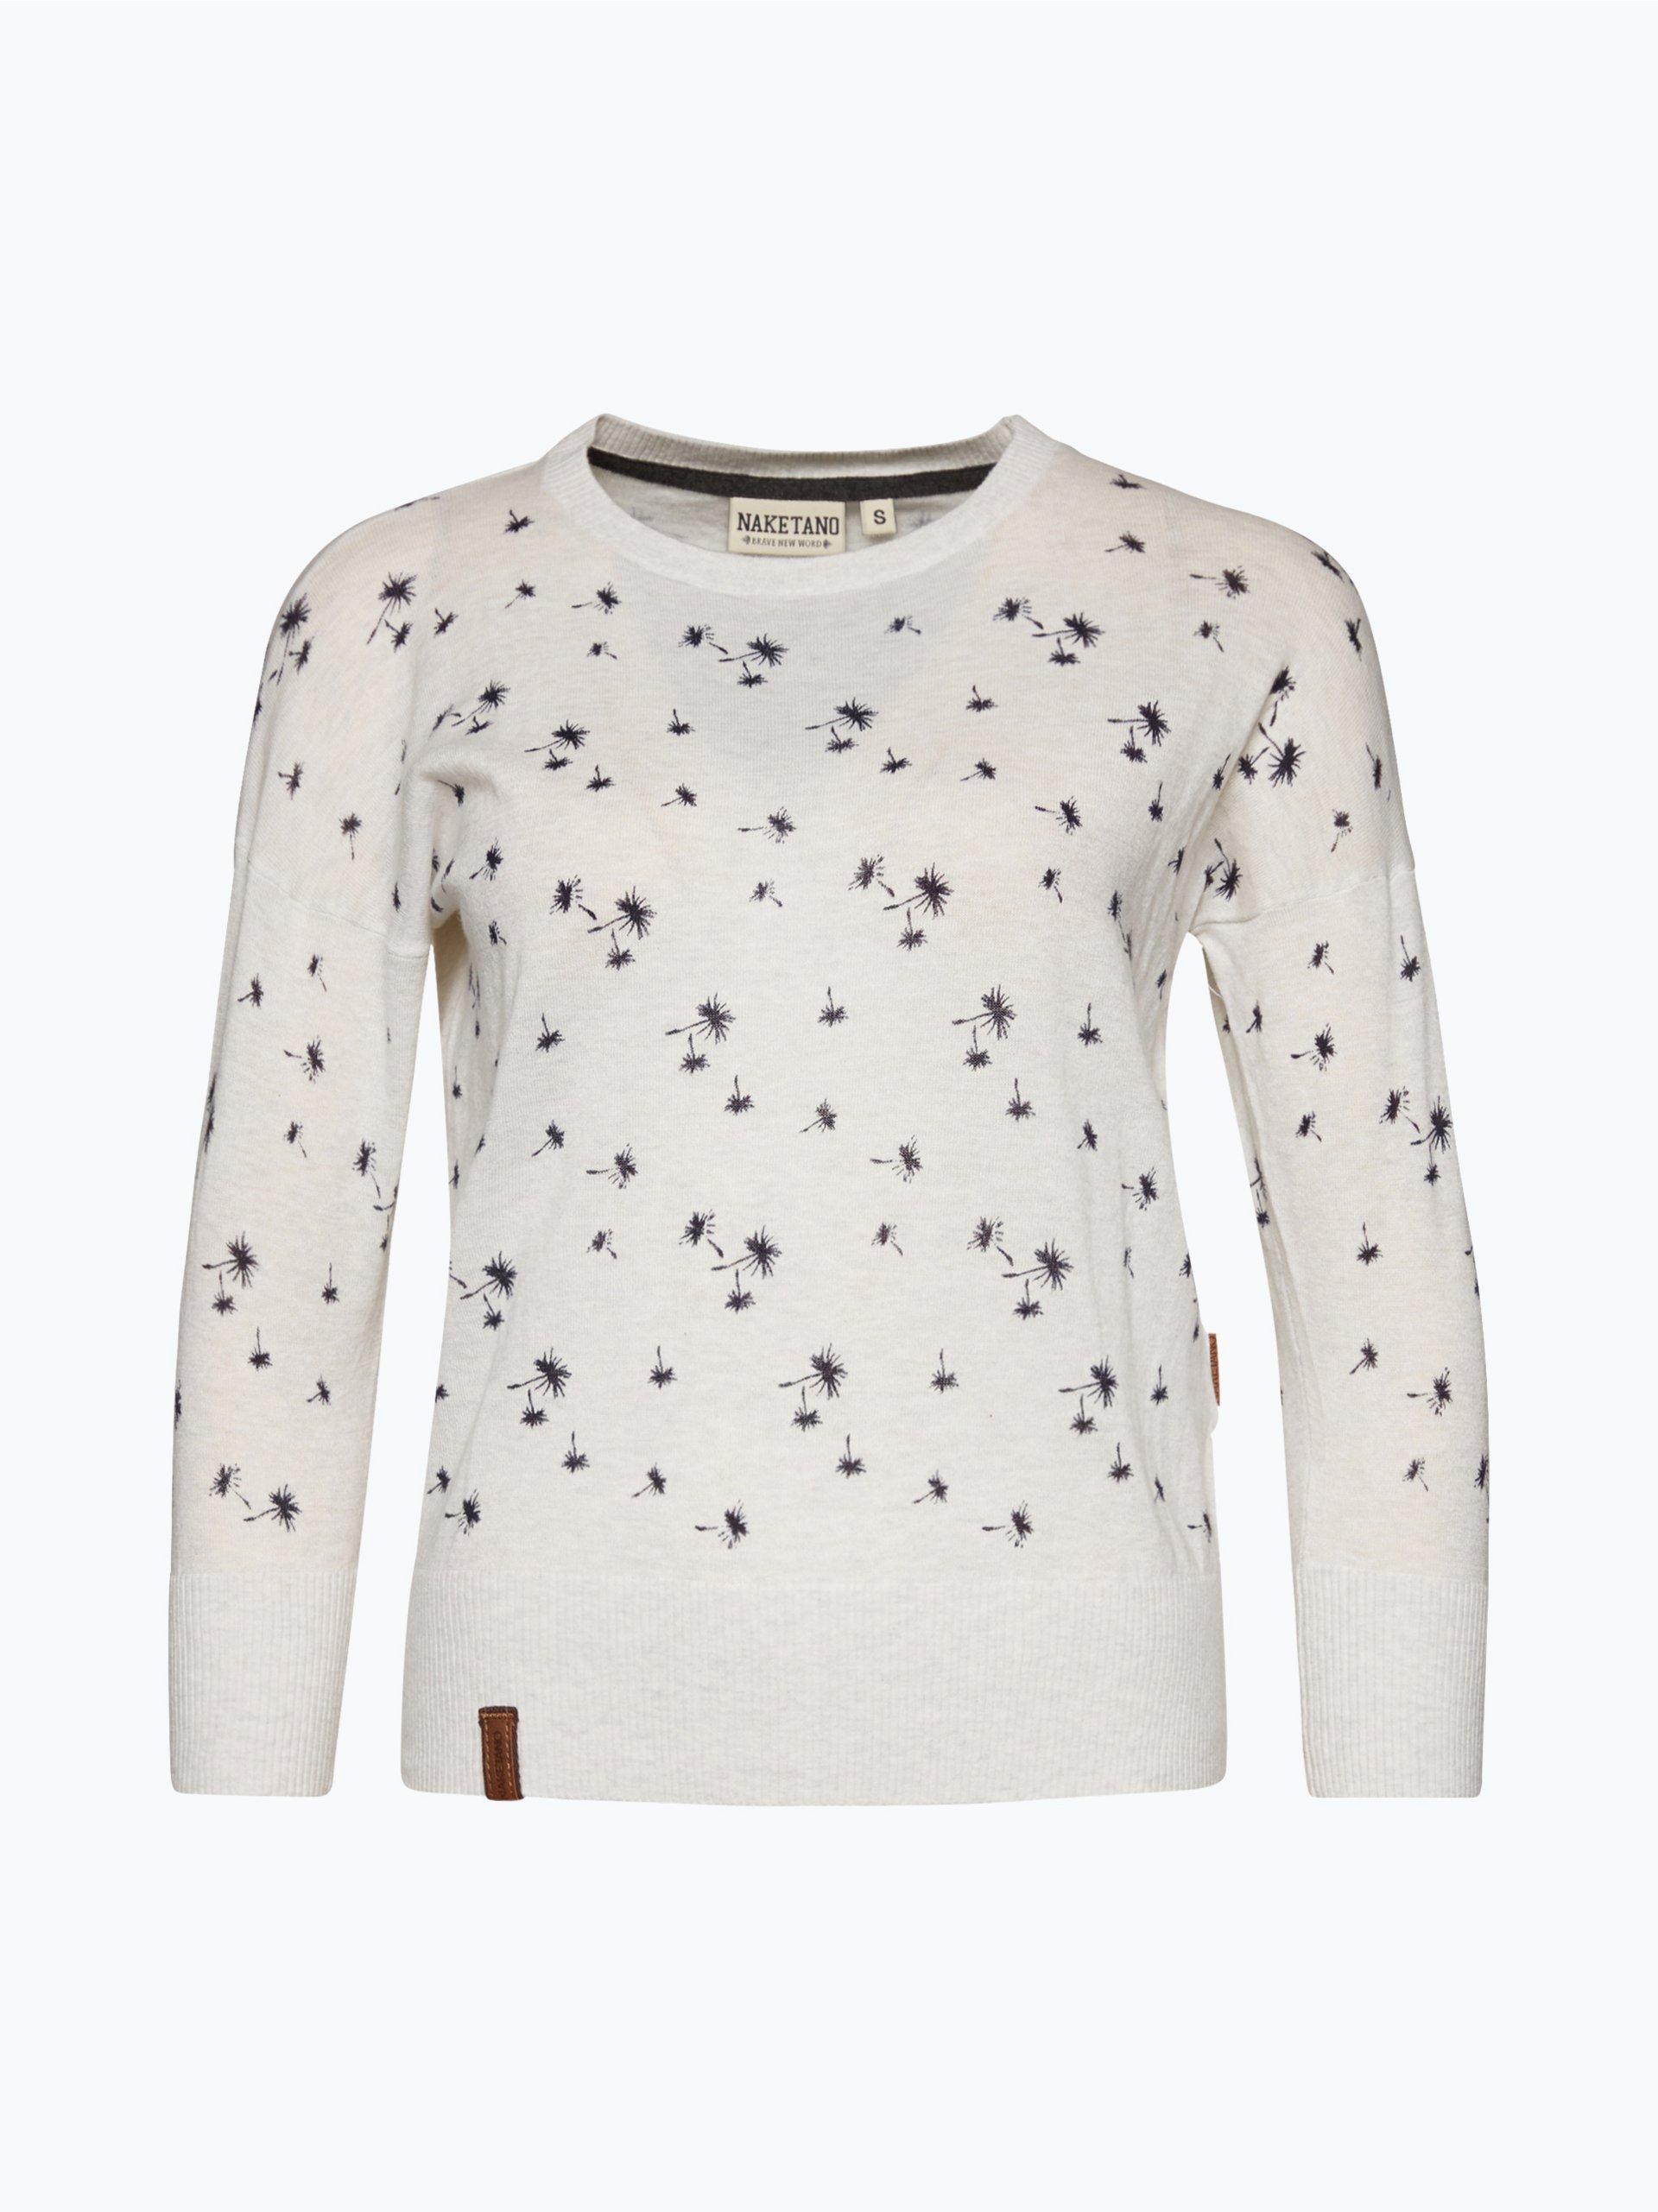 naketano damen pullover maja pusteblume ii grau gemustert online kaufen vangraaf com. Black Bedroom Furniture Sets. Home Design Ideas